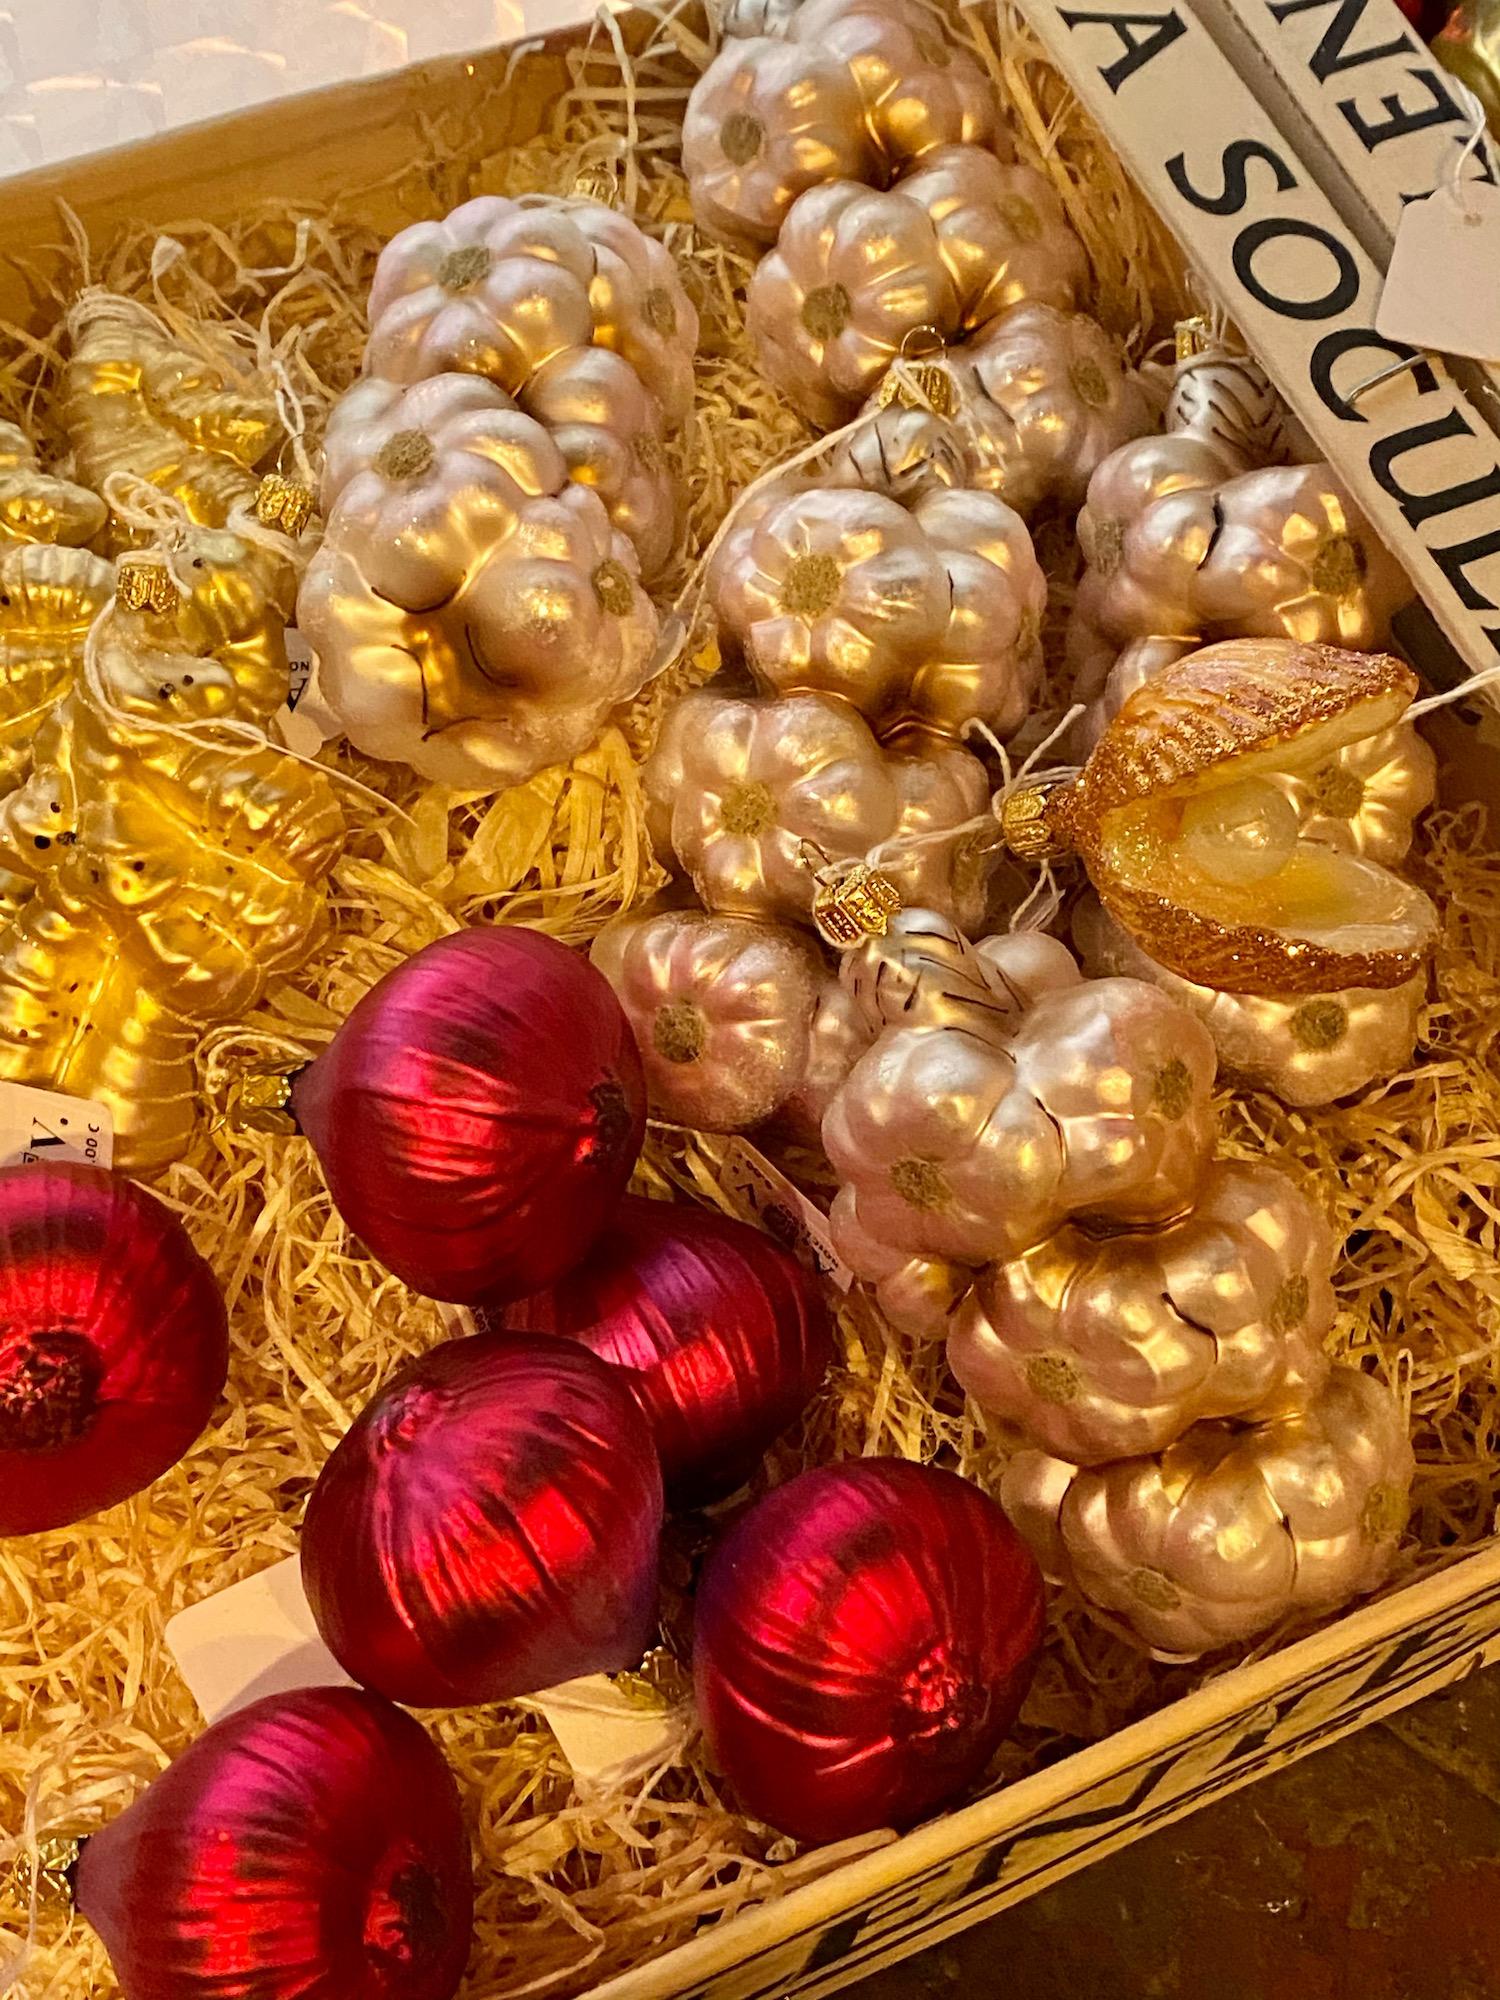 astier de villatte christmas ornament 2020